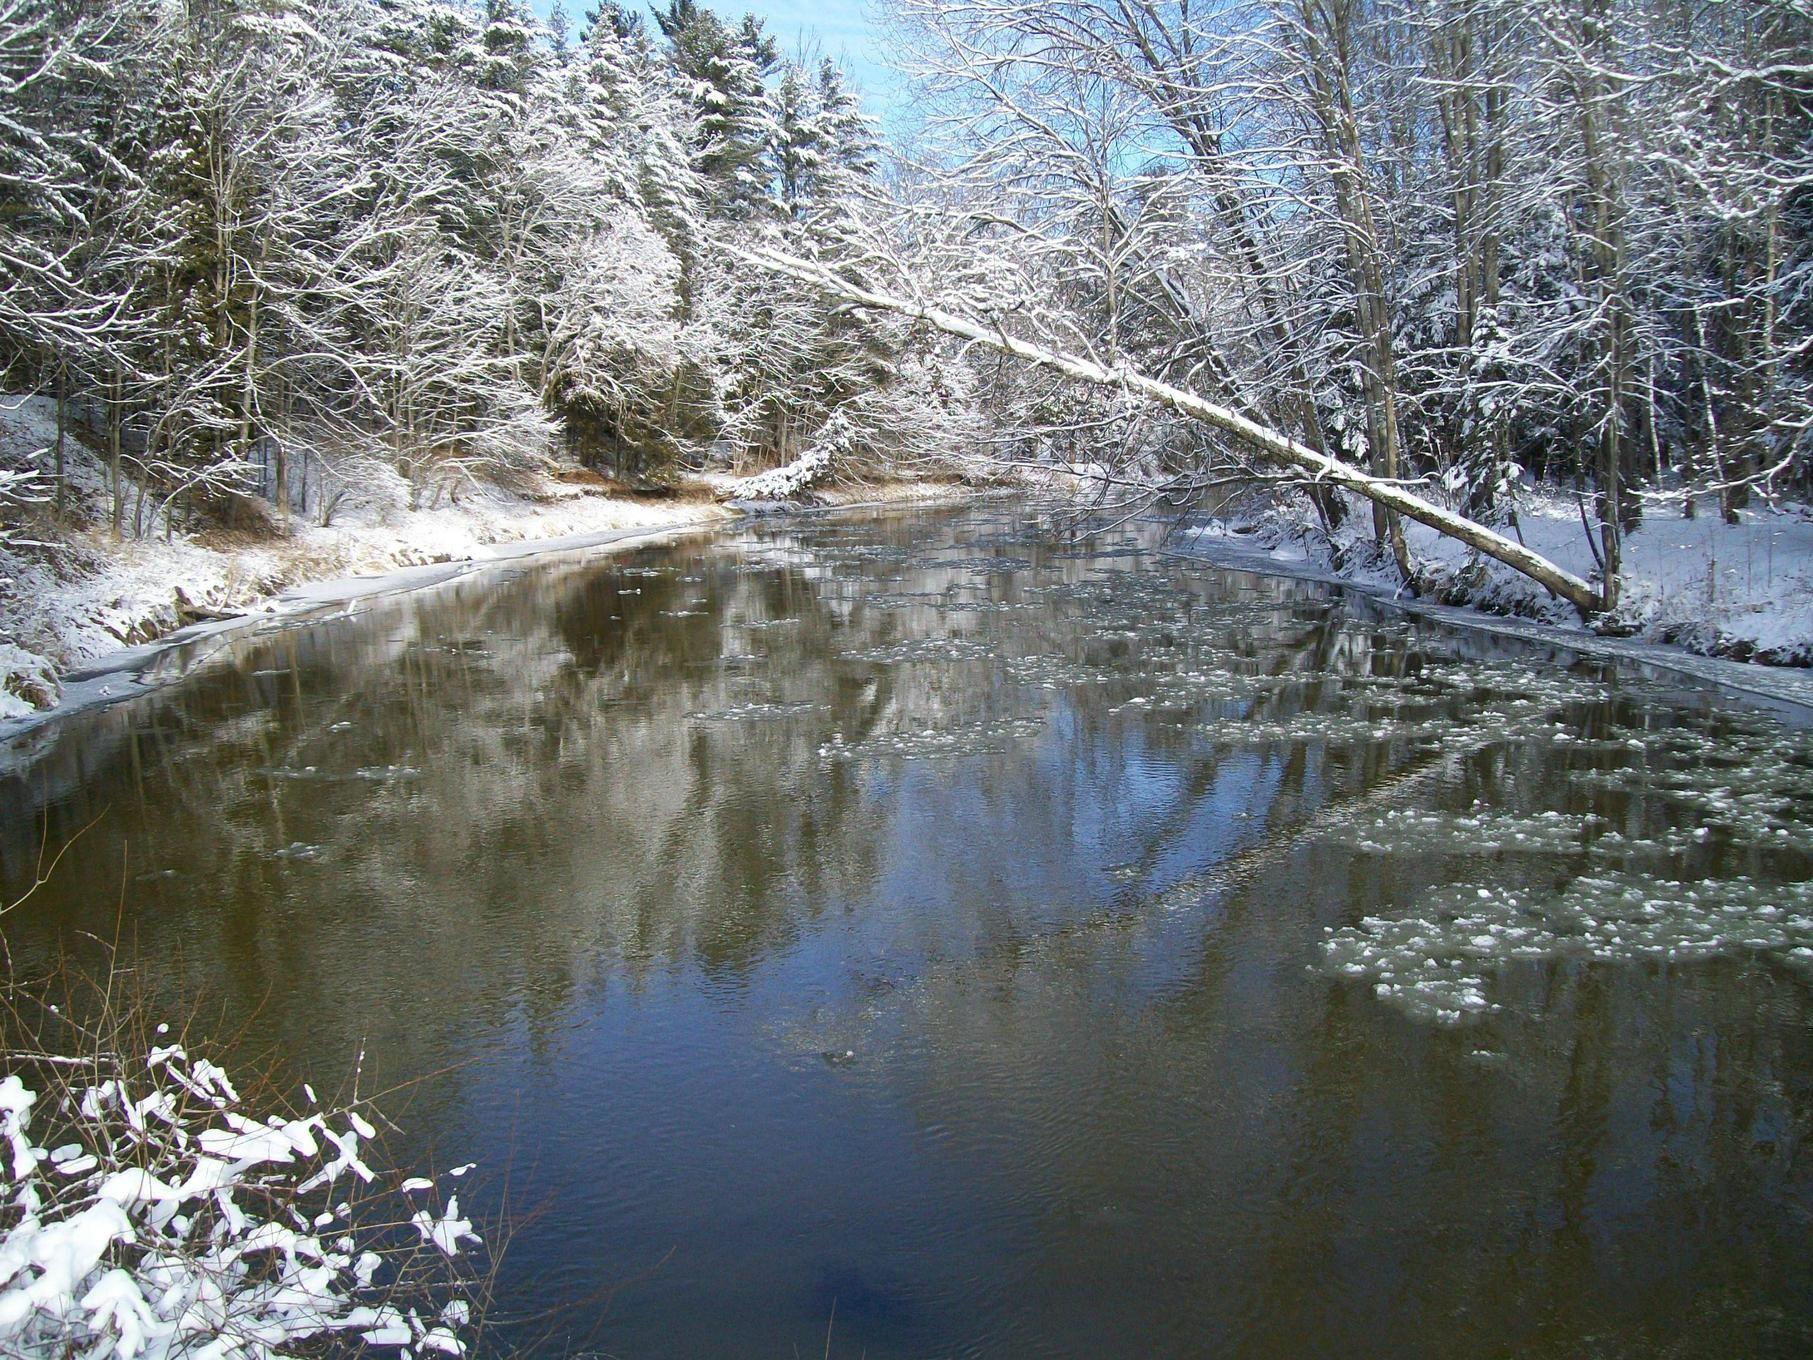 The Rifle river, Standish Michigan.[OC][3664x2748]